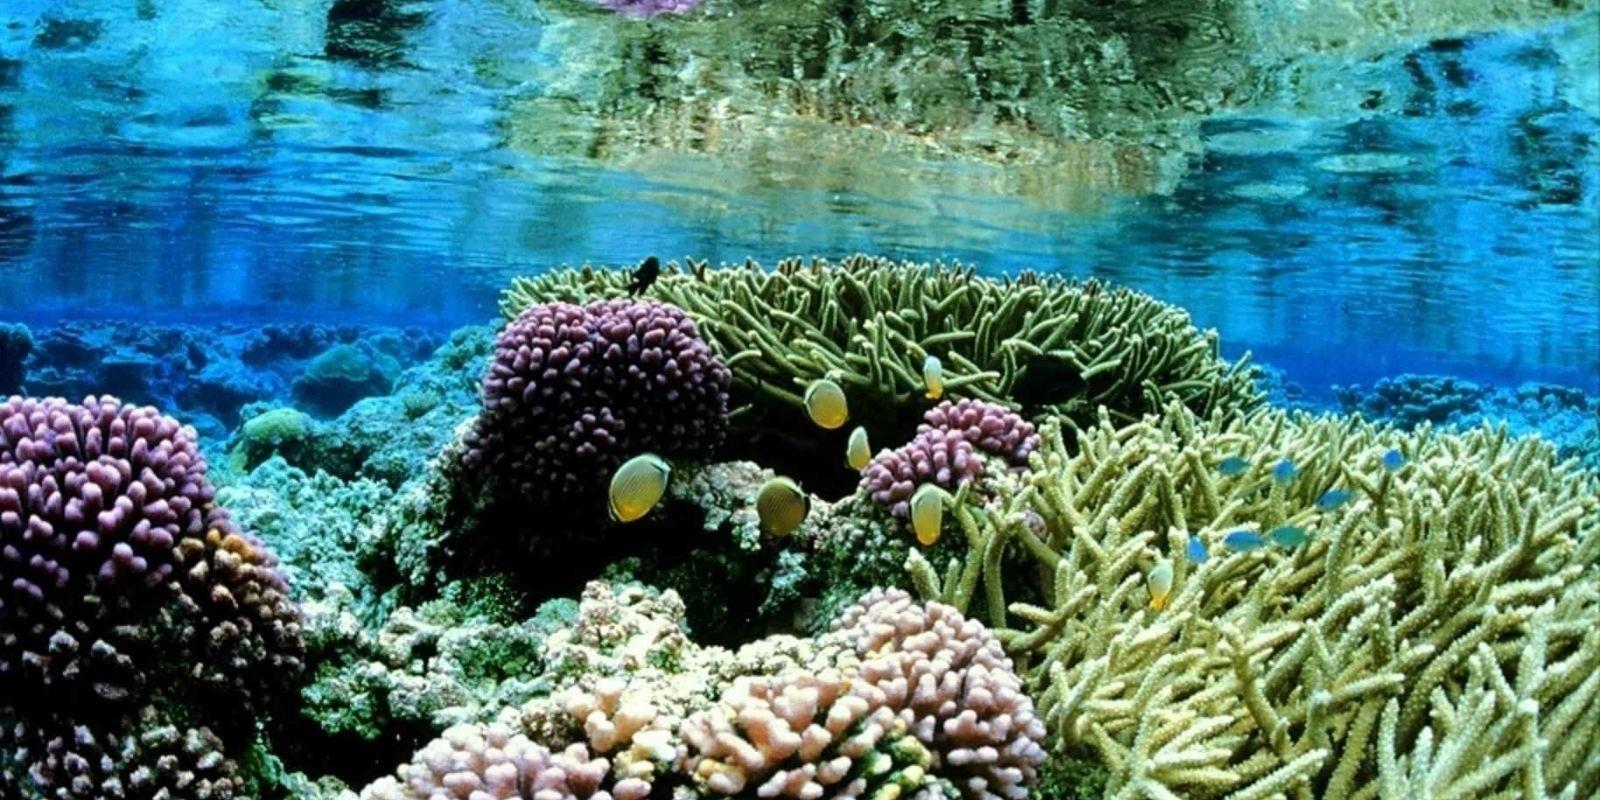 Underwater coral scene